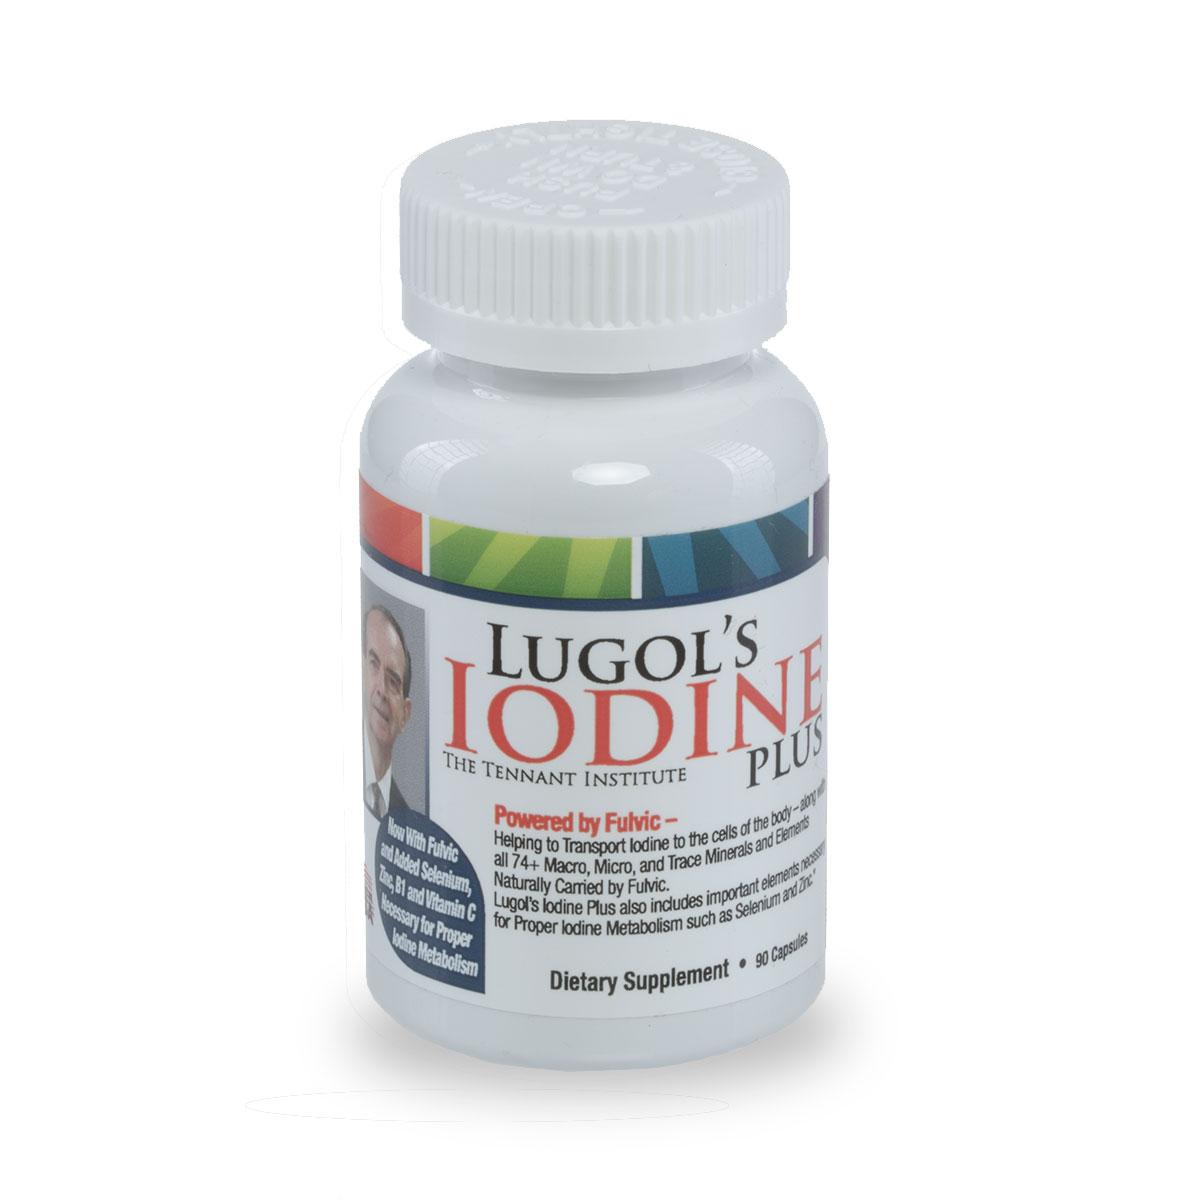 Iodine Plus Lugols formula